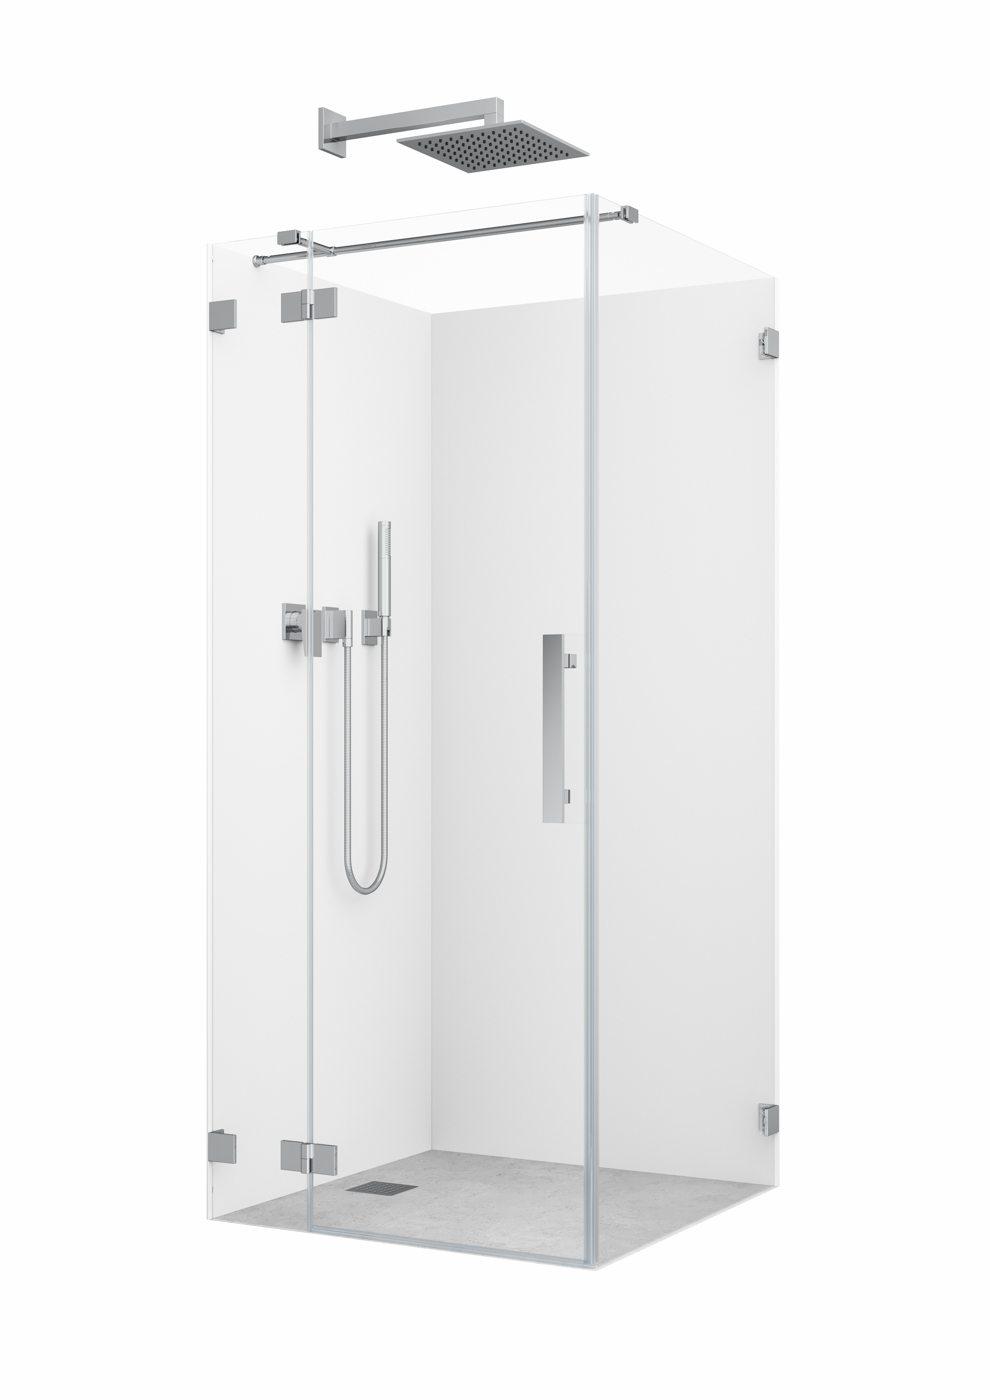 Kabina prysznicowa DISENIO marki Aquante